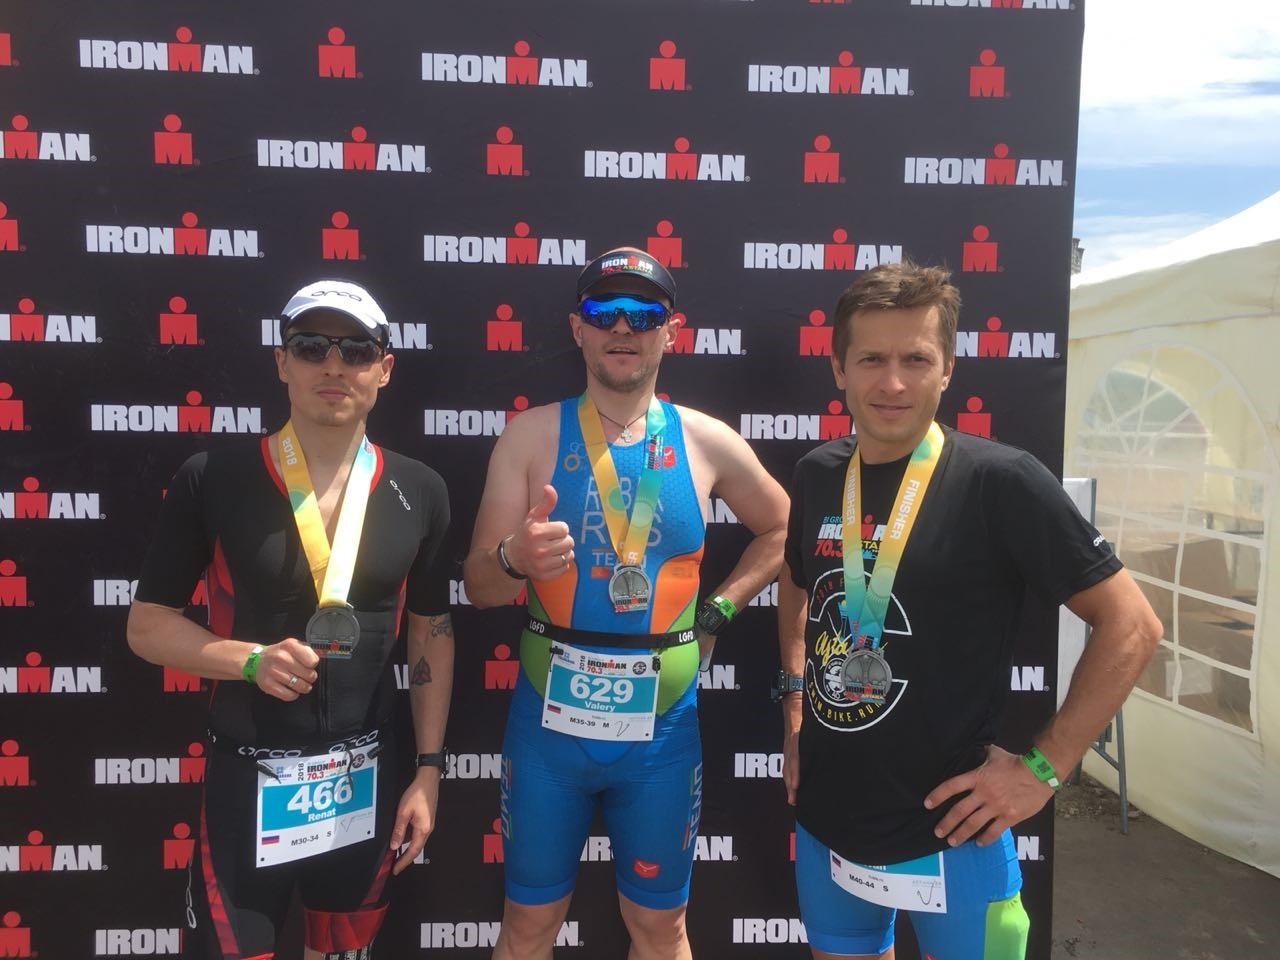 После финиша на Ironman 70.3 Astana